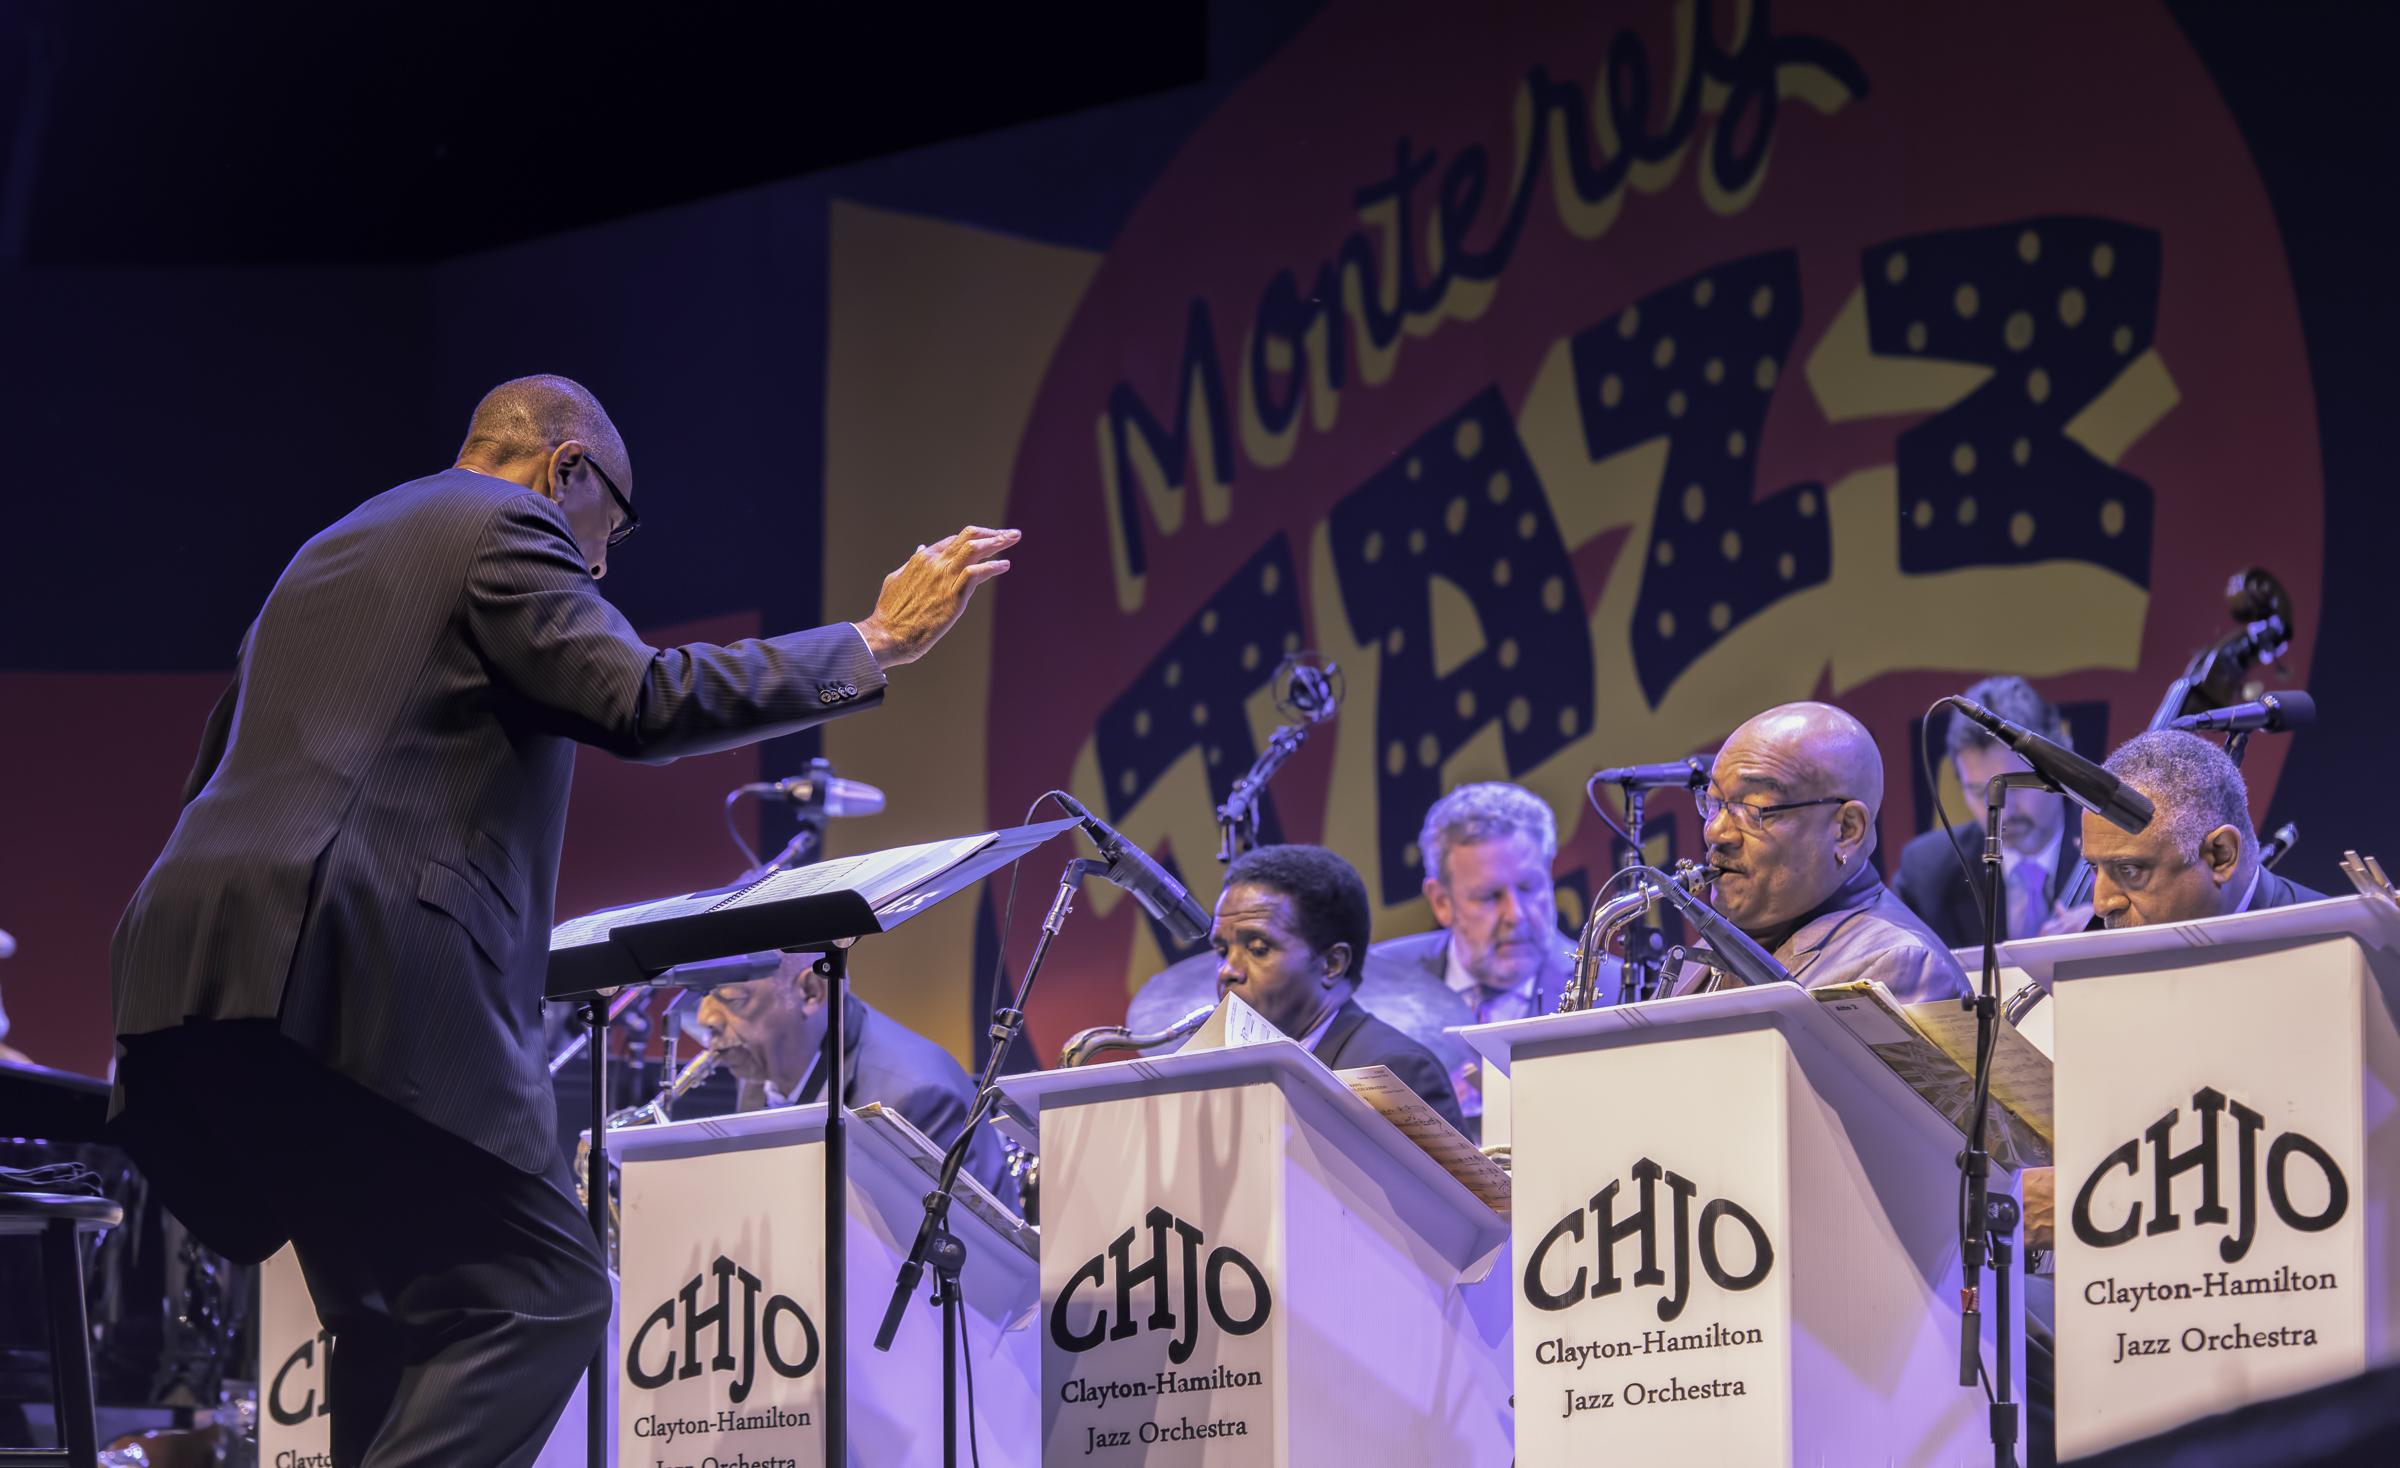 John Clayton and the Clayton-Hamilton Jazz Orchestra at the Monterey Jazz Festival